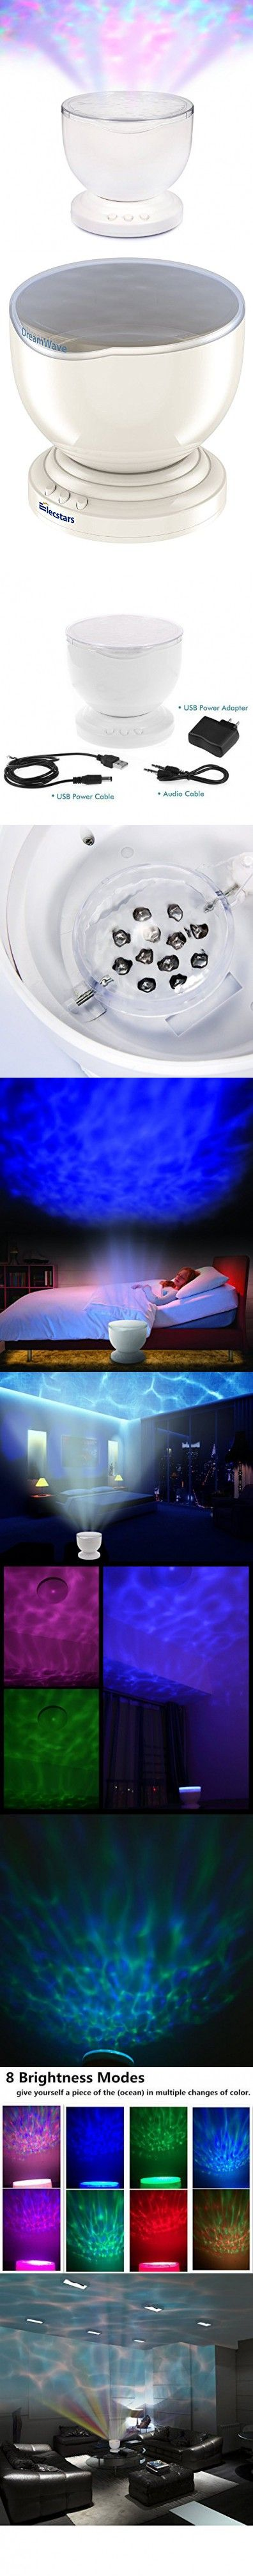 Led night light kickstarter - Ocean Wave Night Light Elecstars Music Player Multicolor Led Bulbs Projection Lamp Romance